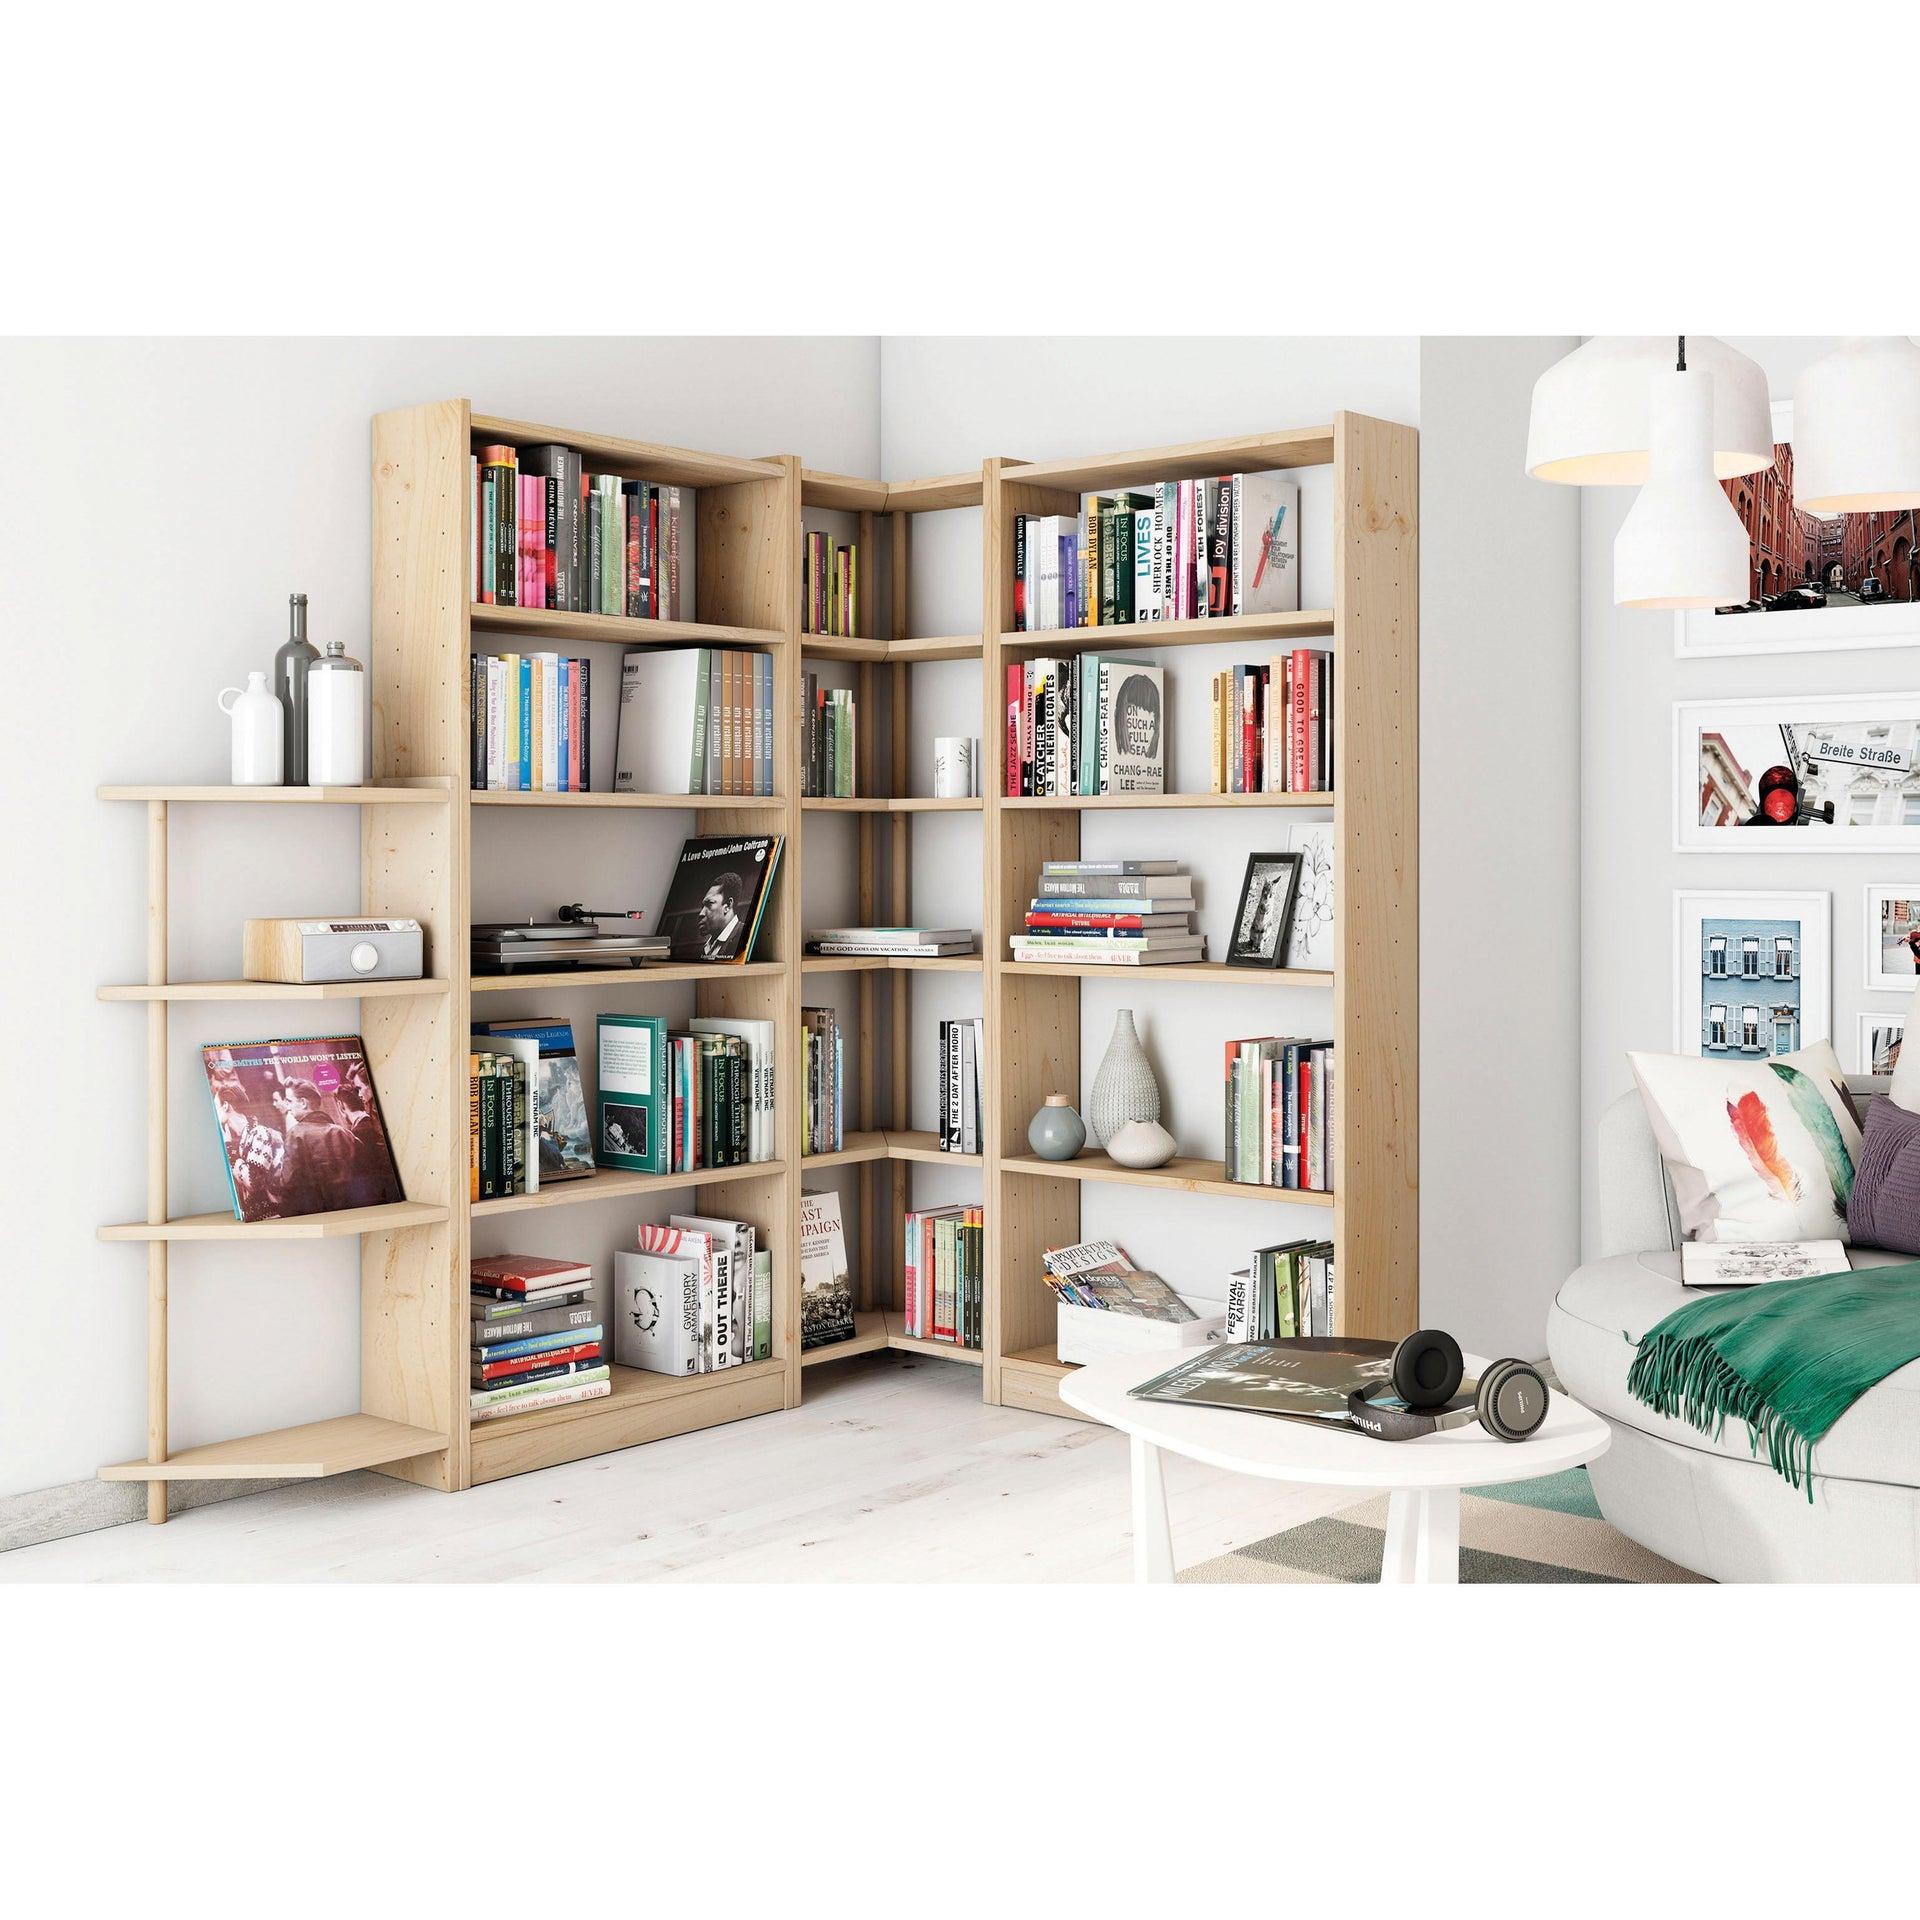 Libreria Gala L 80 x P 25 x H 184.7 cm - 6